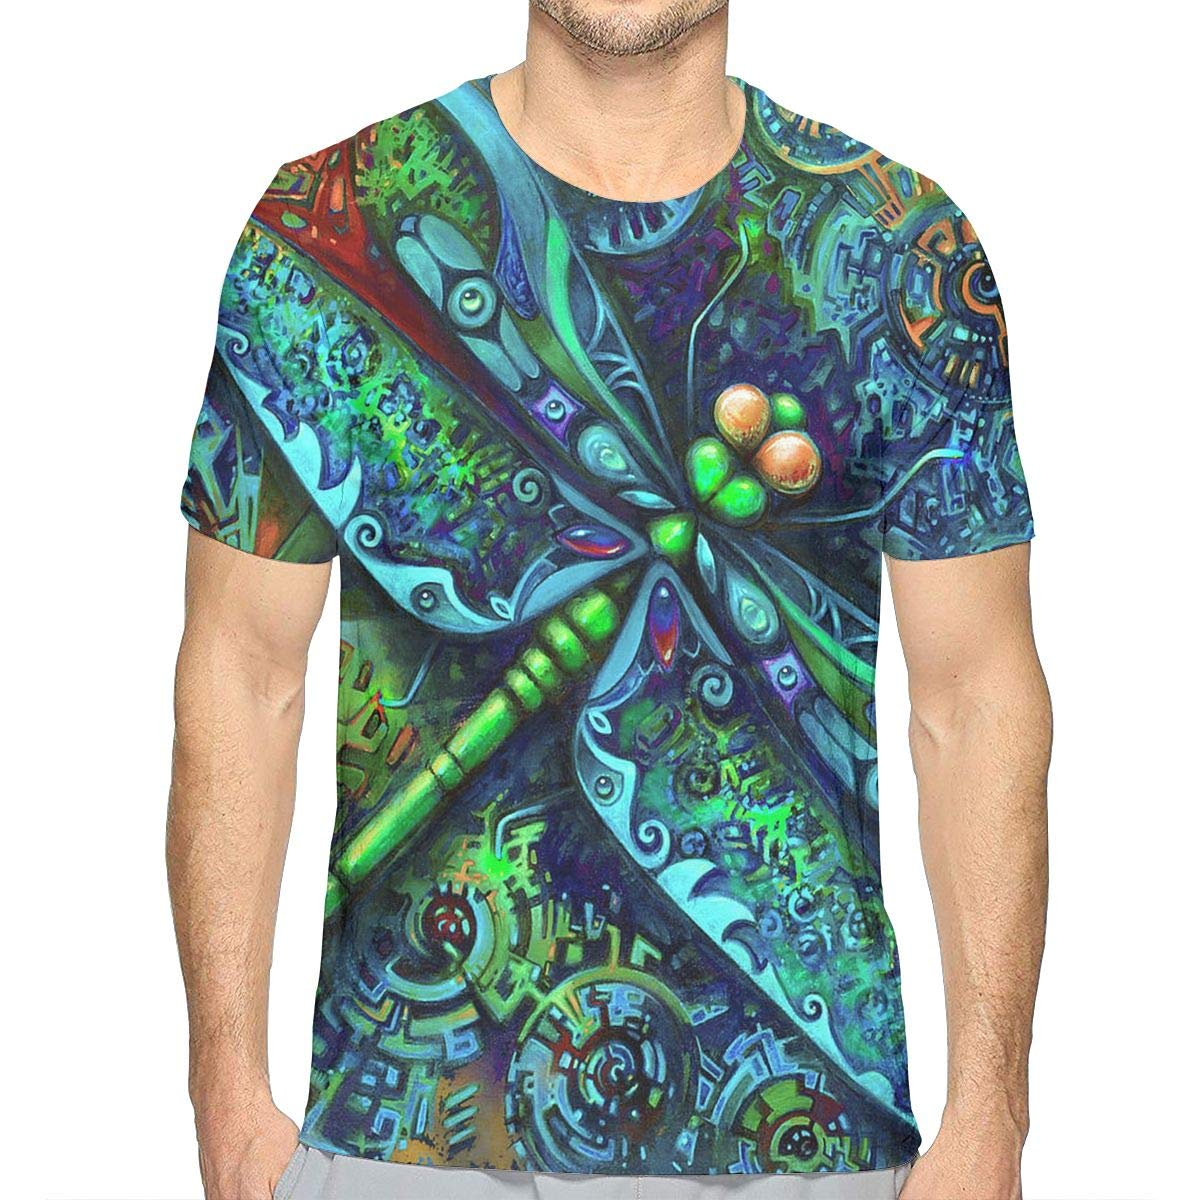 Short Sleeve Shirt Tops for Men Boys Teens Adult, Regular Big and Tall Sizes